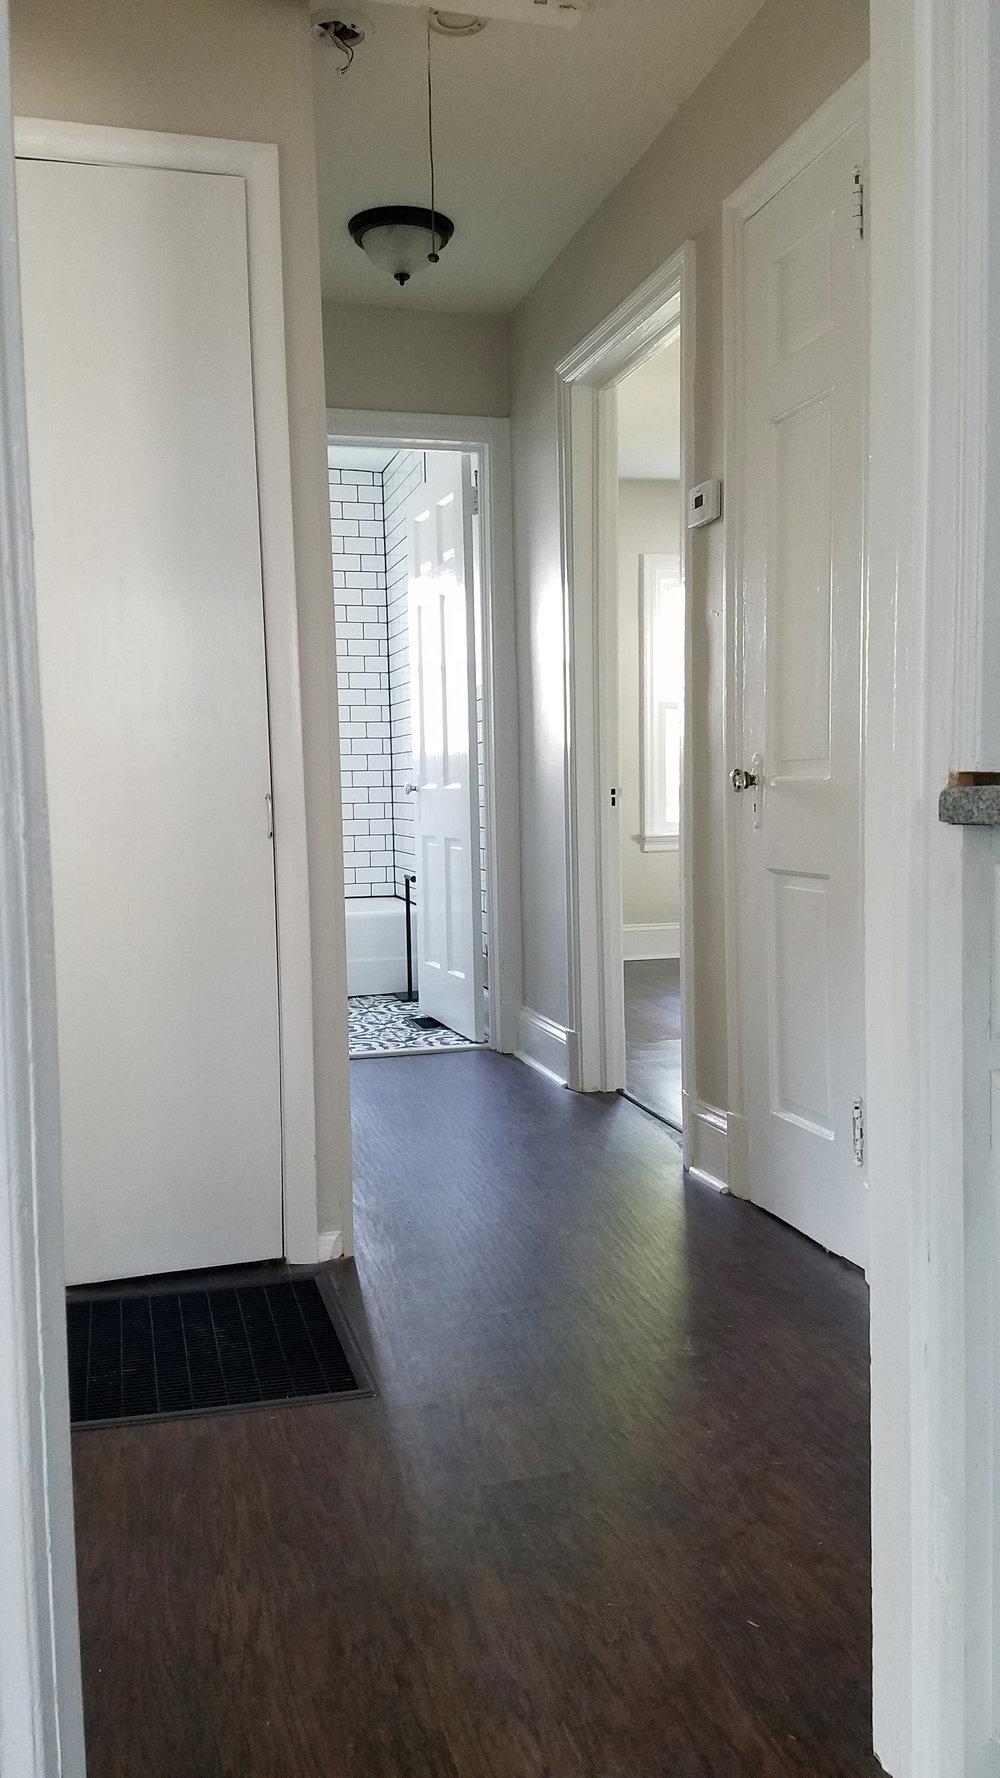 Haymount Homes Glenville House Hallway.jpg